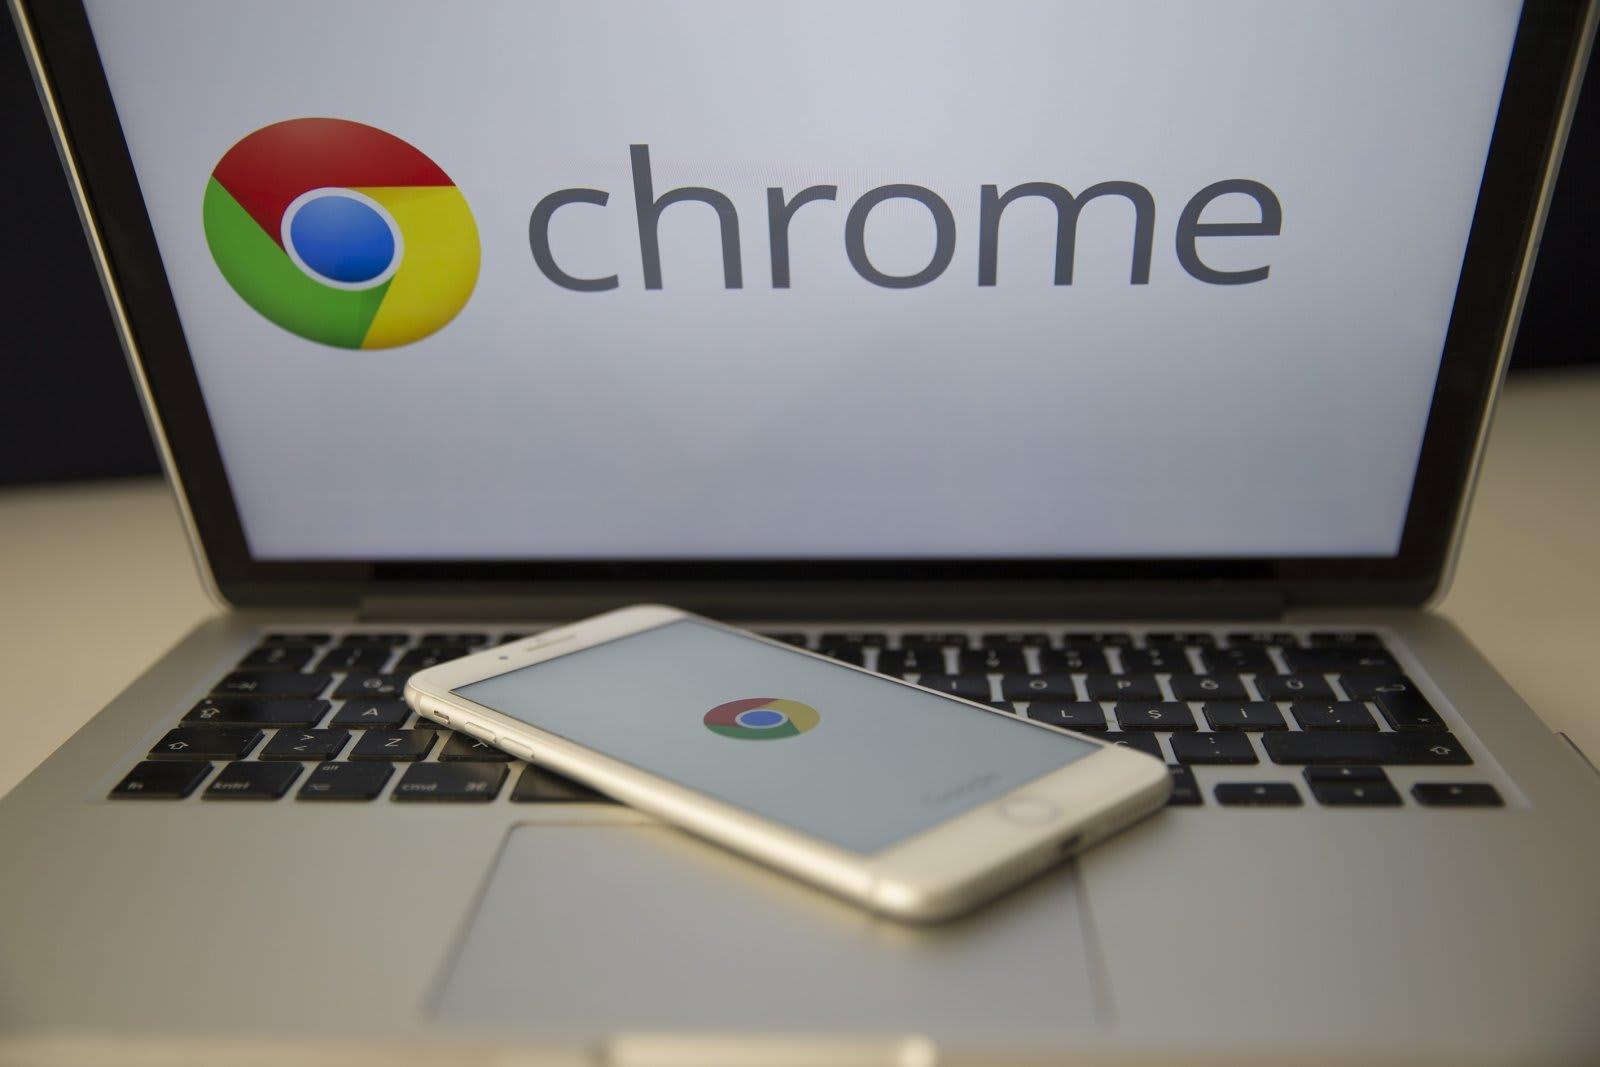 Chrome filtering ads